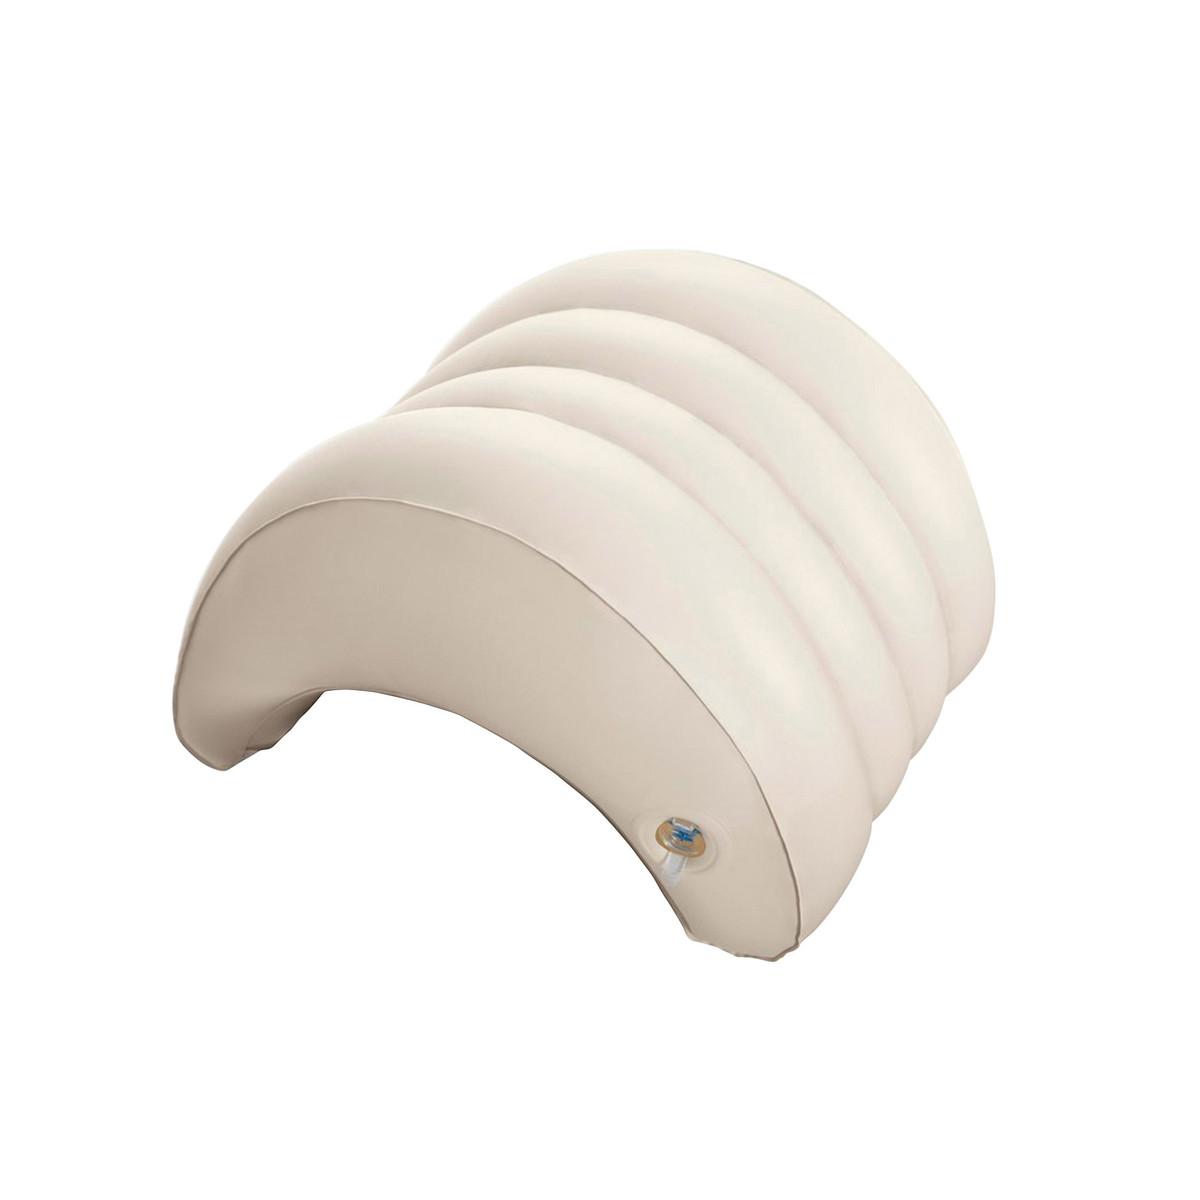 intex pure spa headrest spa accessories splash super center. Black Bedroom Furniture Sets. Home Design Ideas